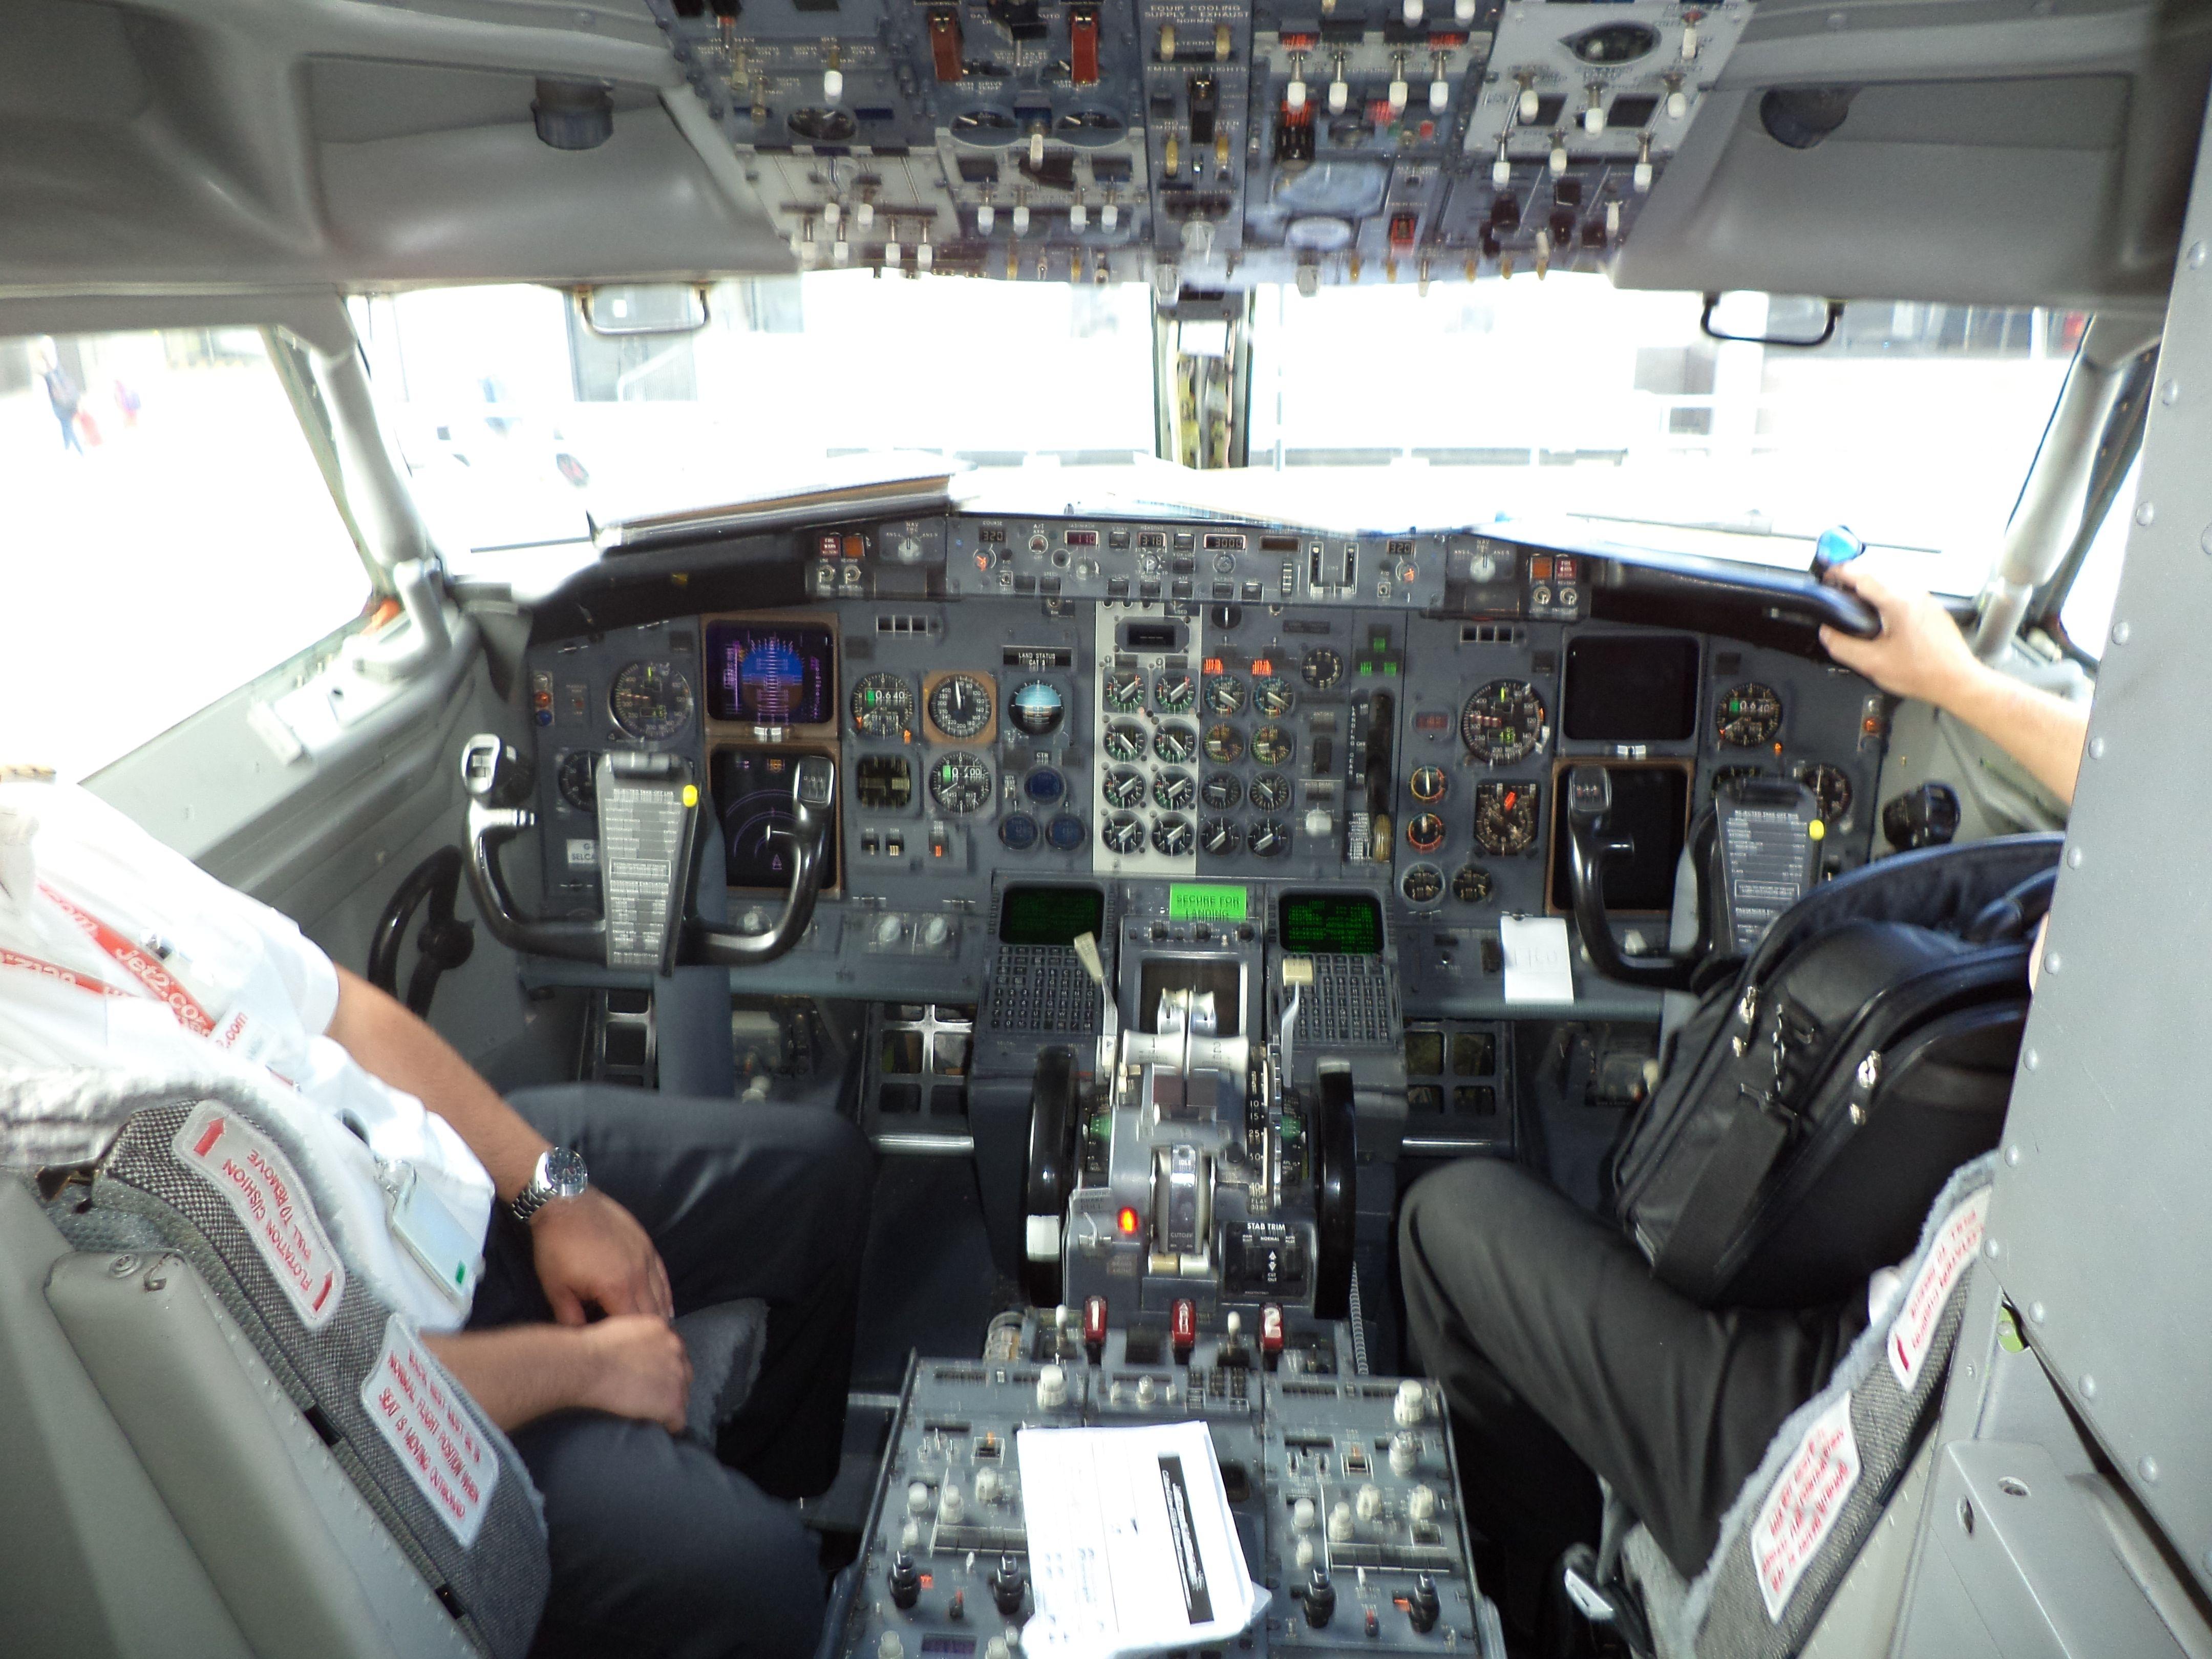 jet2 com boeing 737-300 cockpit | PLANE LOVE 3 | Flight deck, Plane